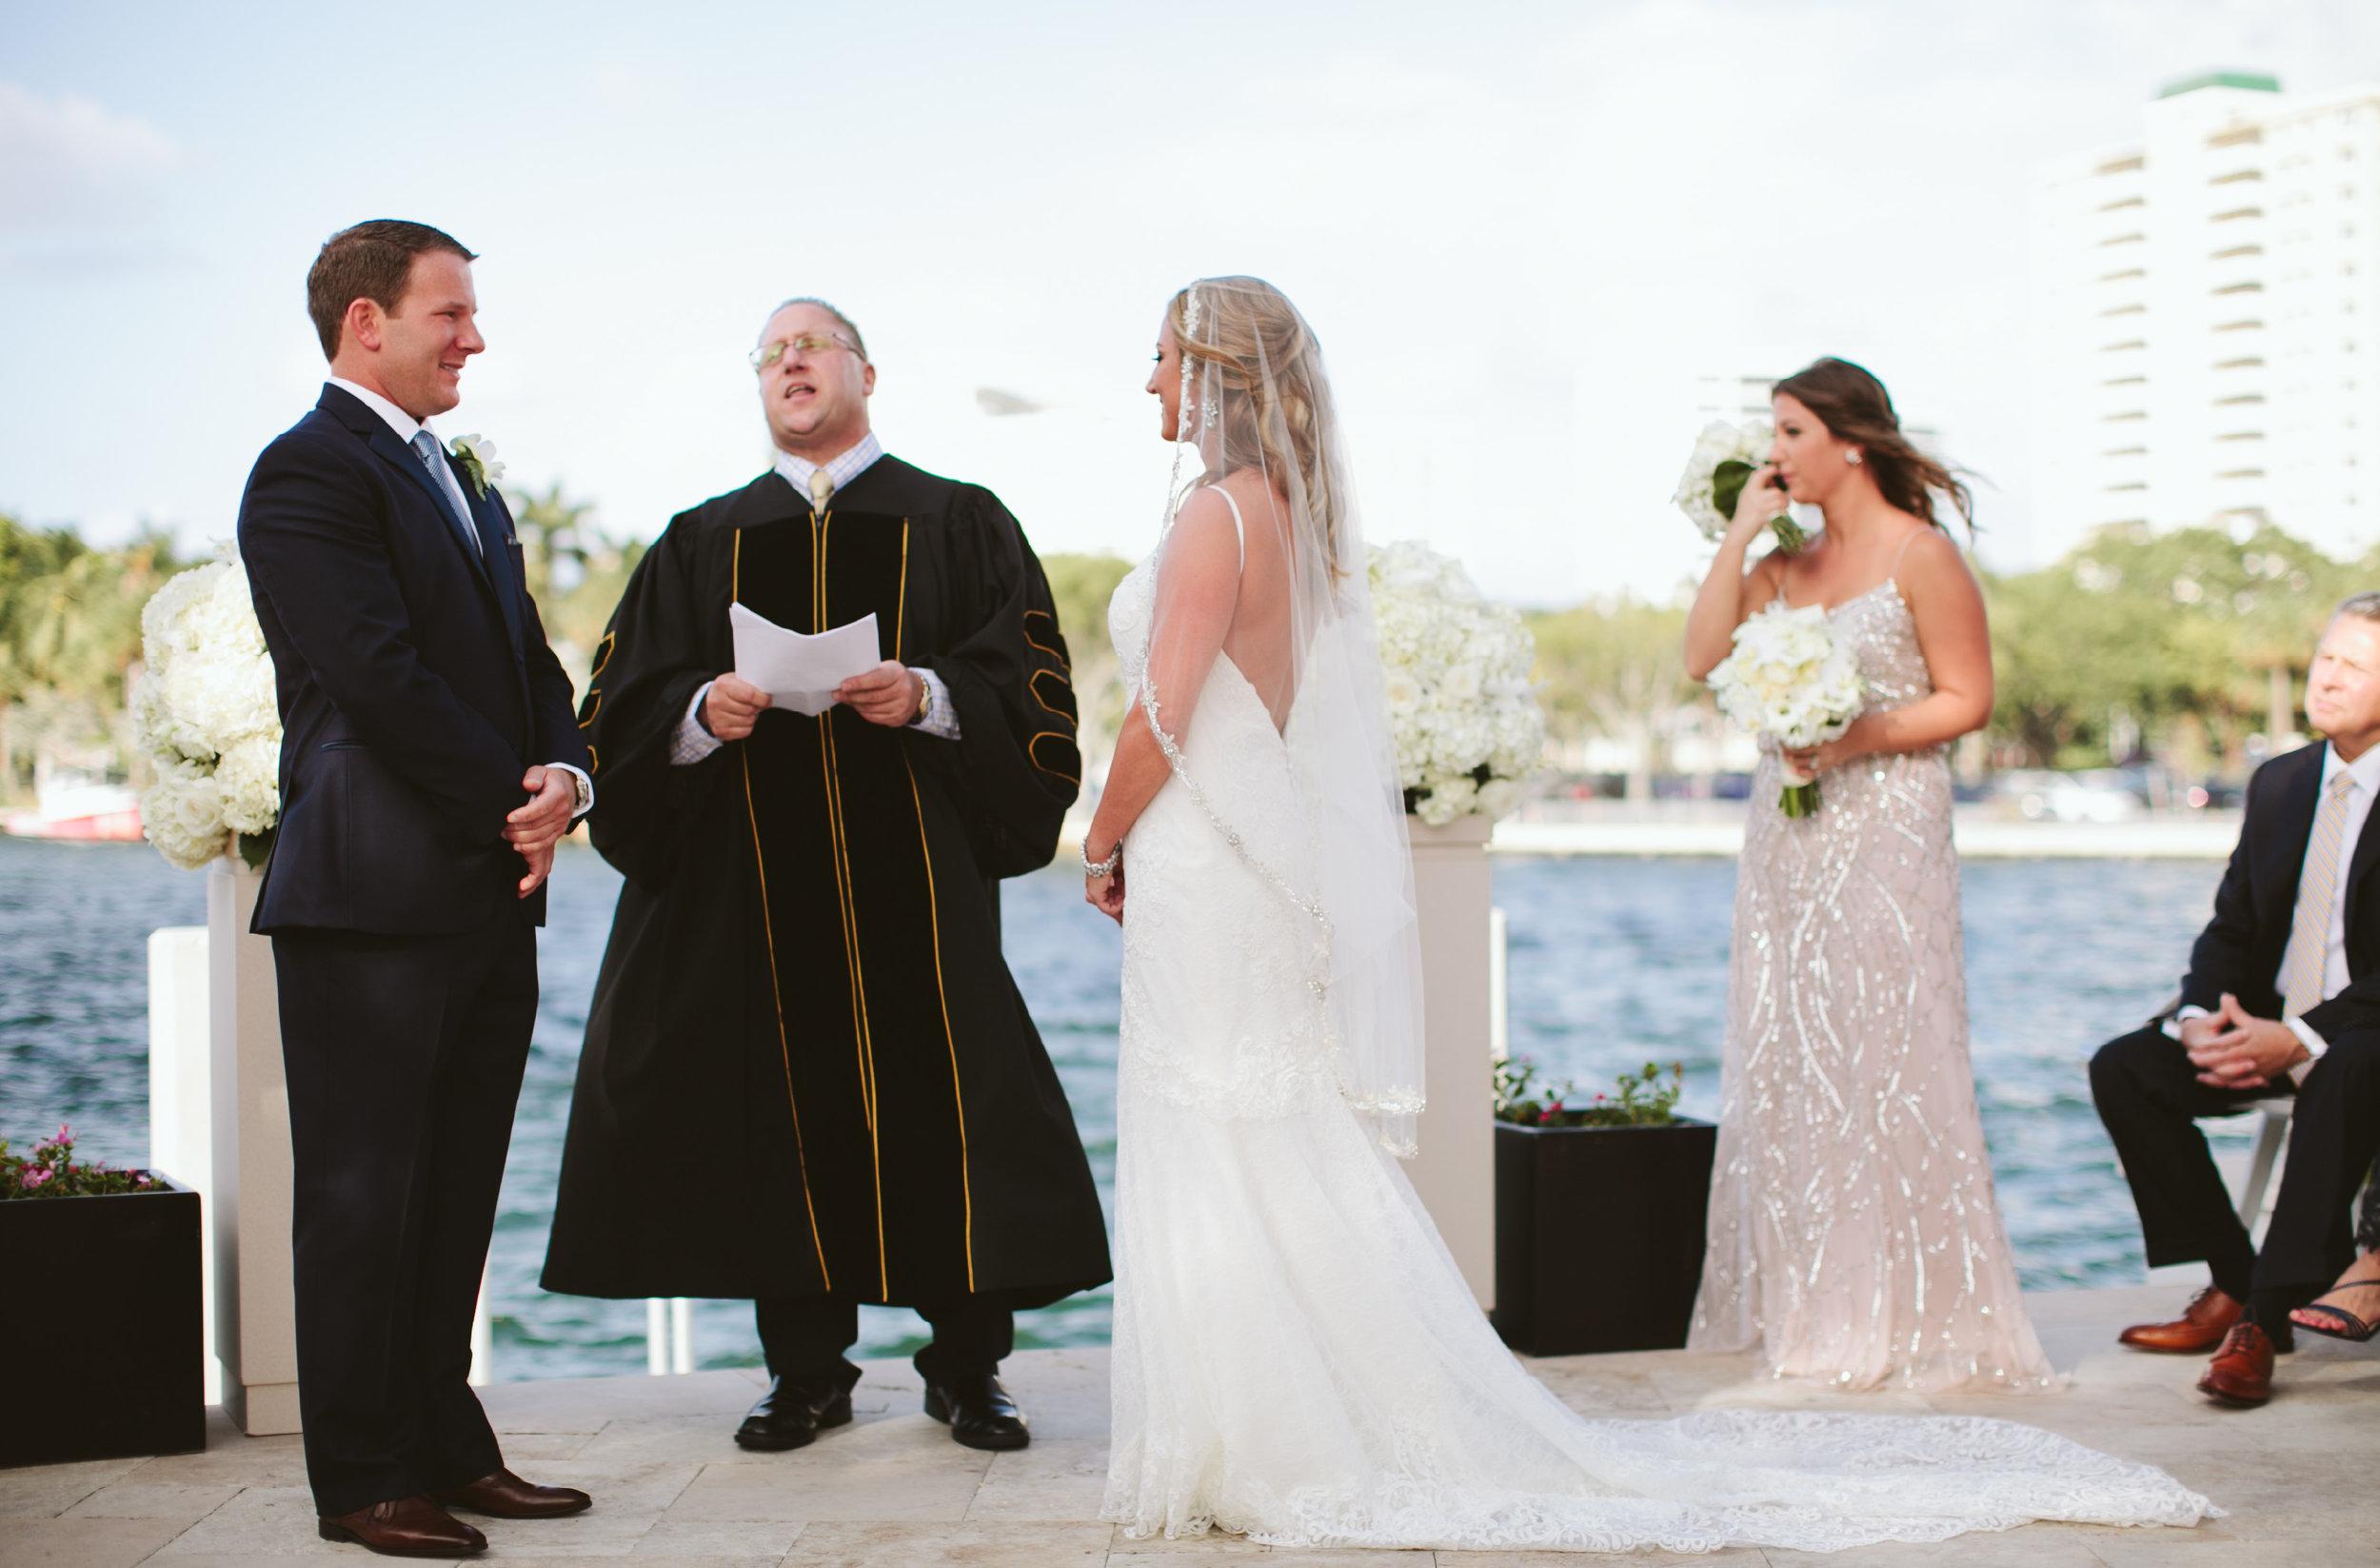 Kim + John's Wedding at the Waterstone Hotel in Boca Raton48.jpg